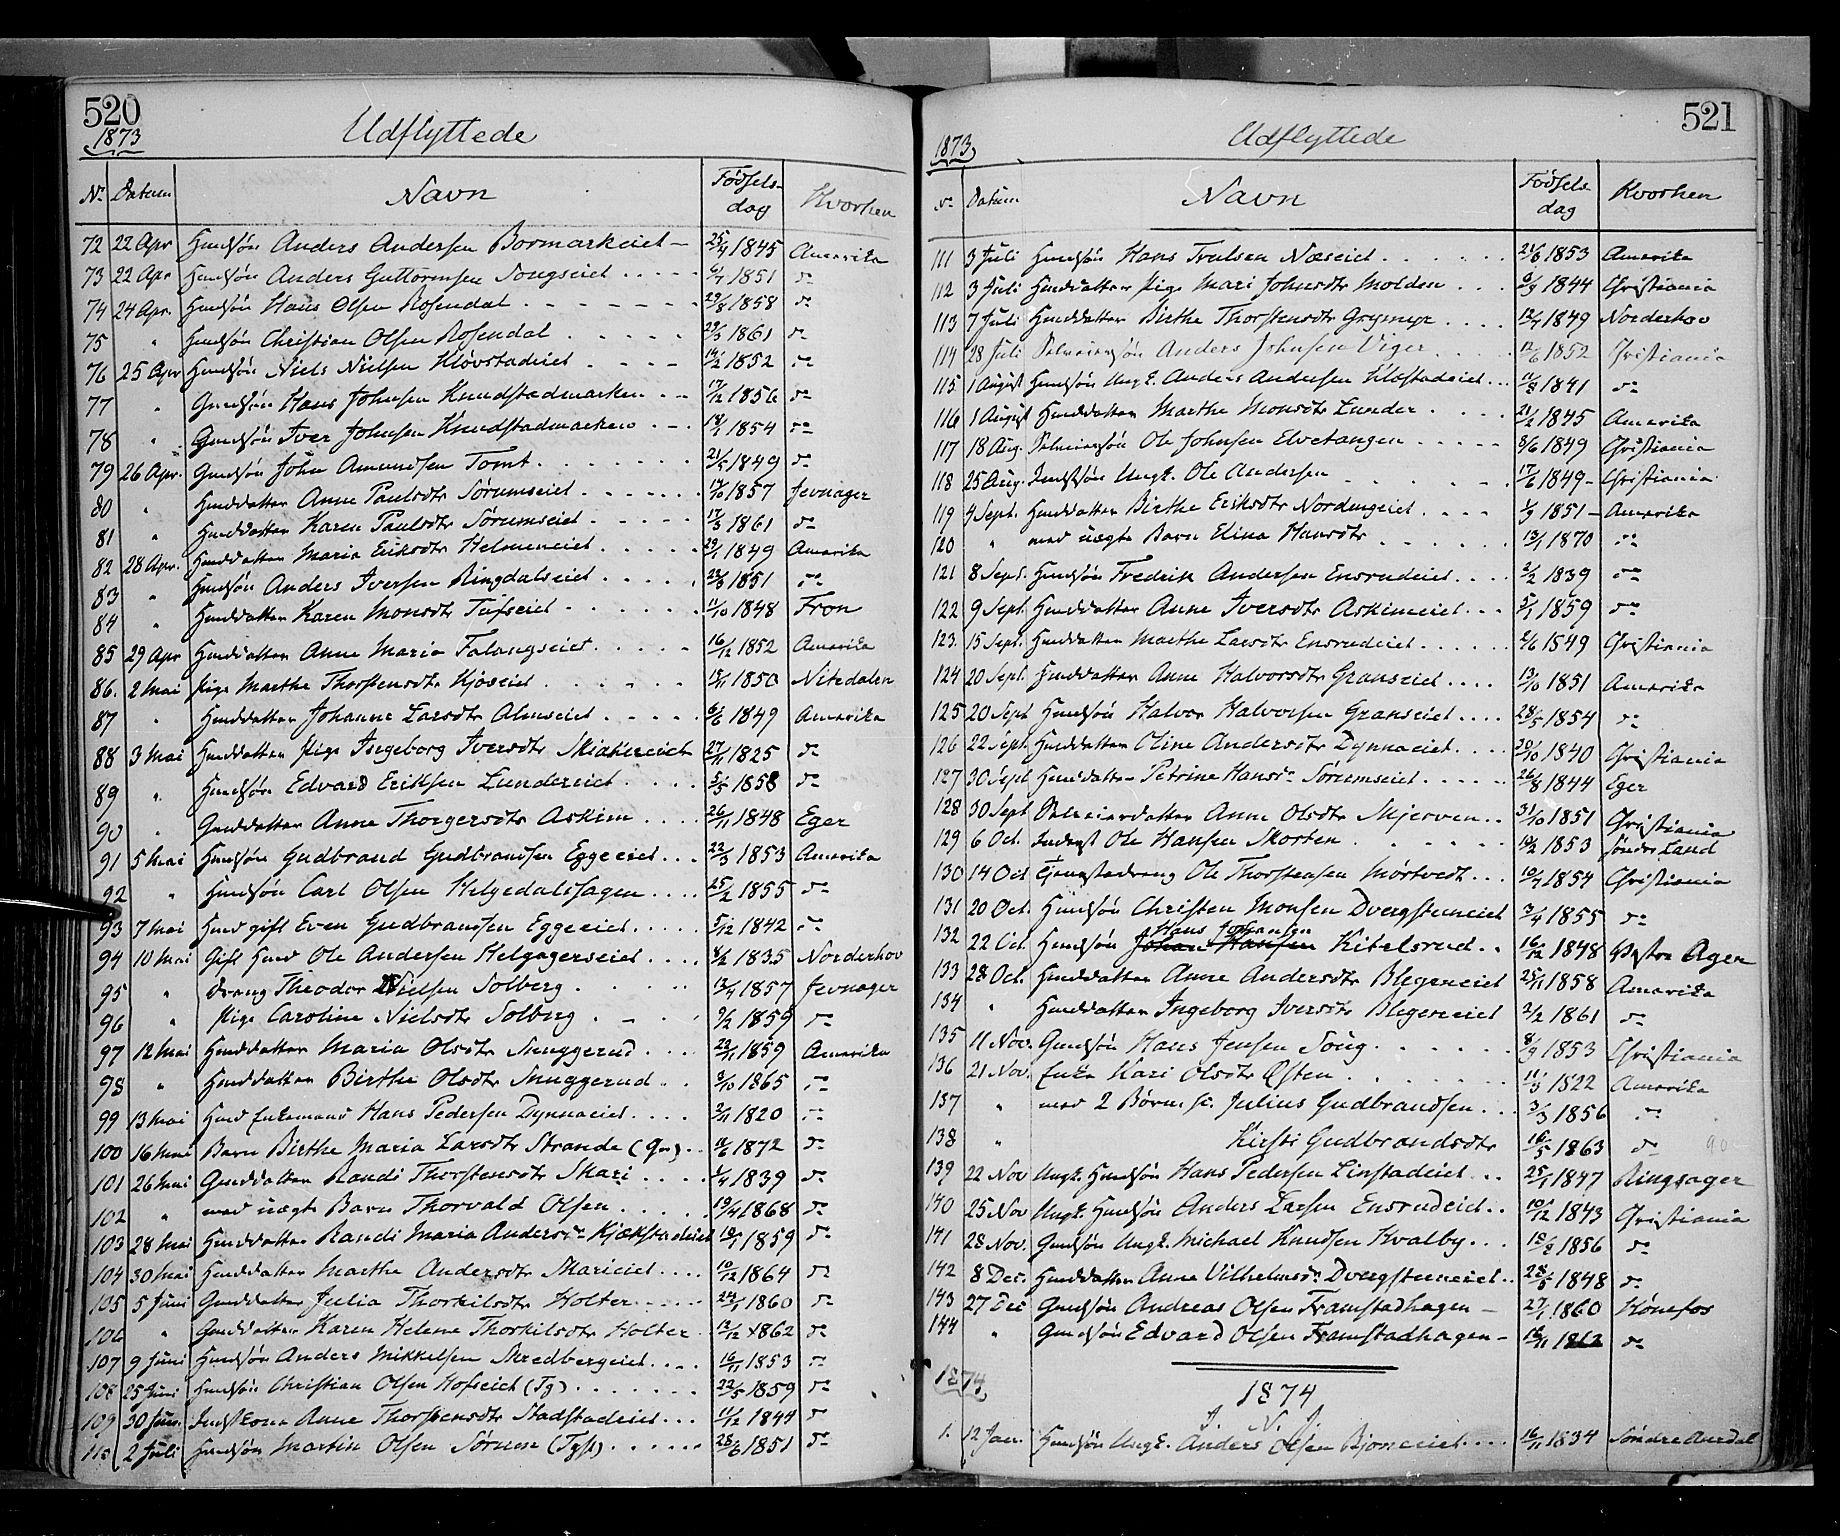 SAH, Gran prestekontor, Ministerialbok nr. 12, 1856-1874, s. 520-521